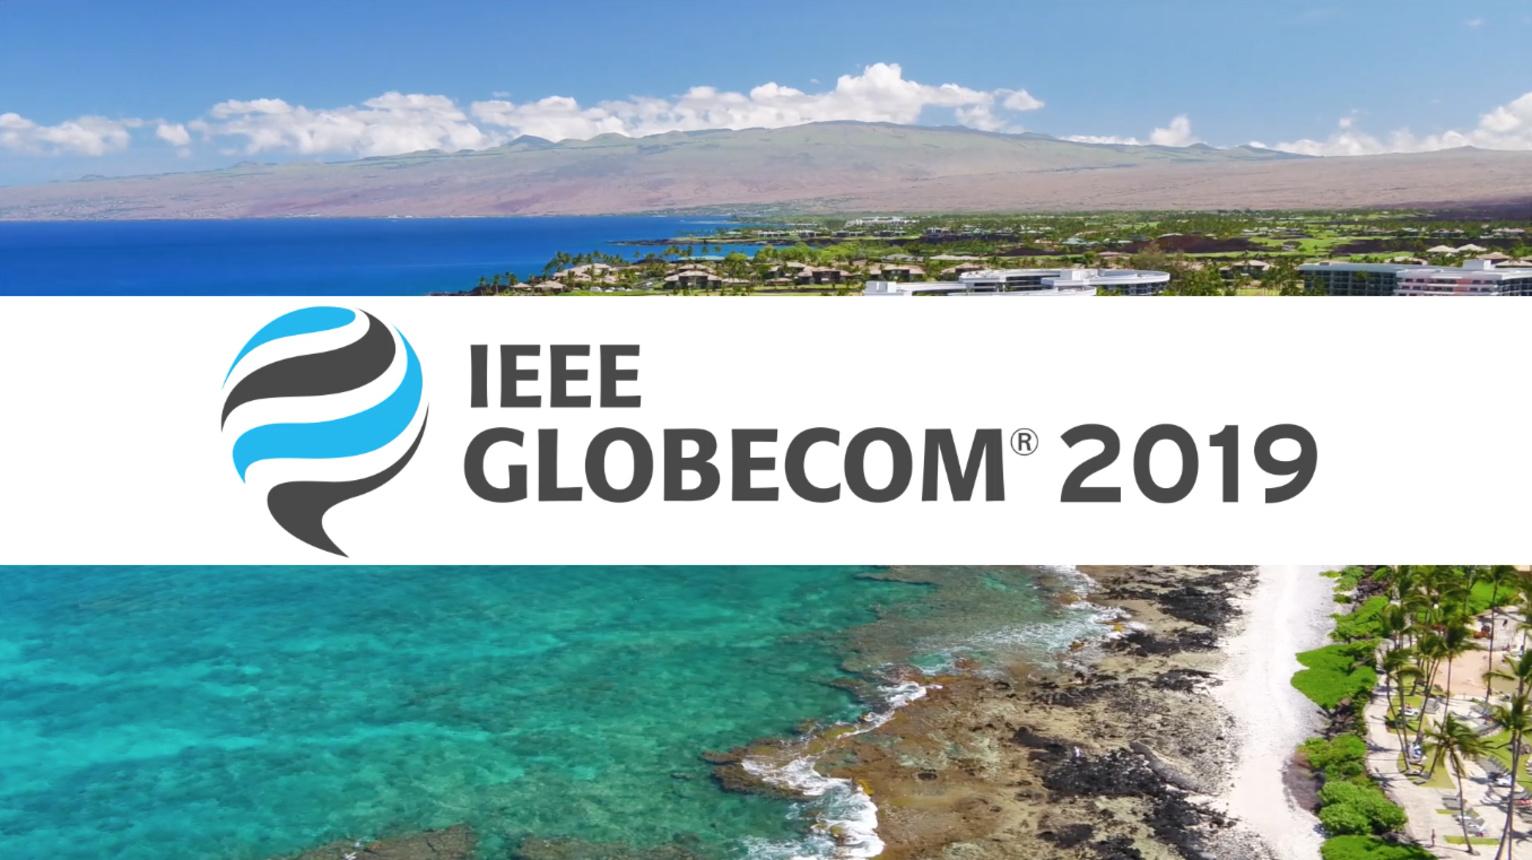 Nakazato and Li presented in GLOBECOM2019